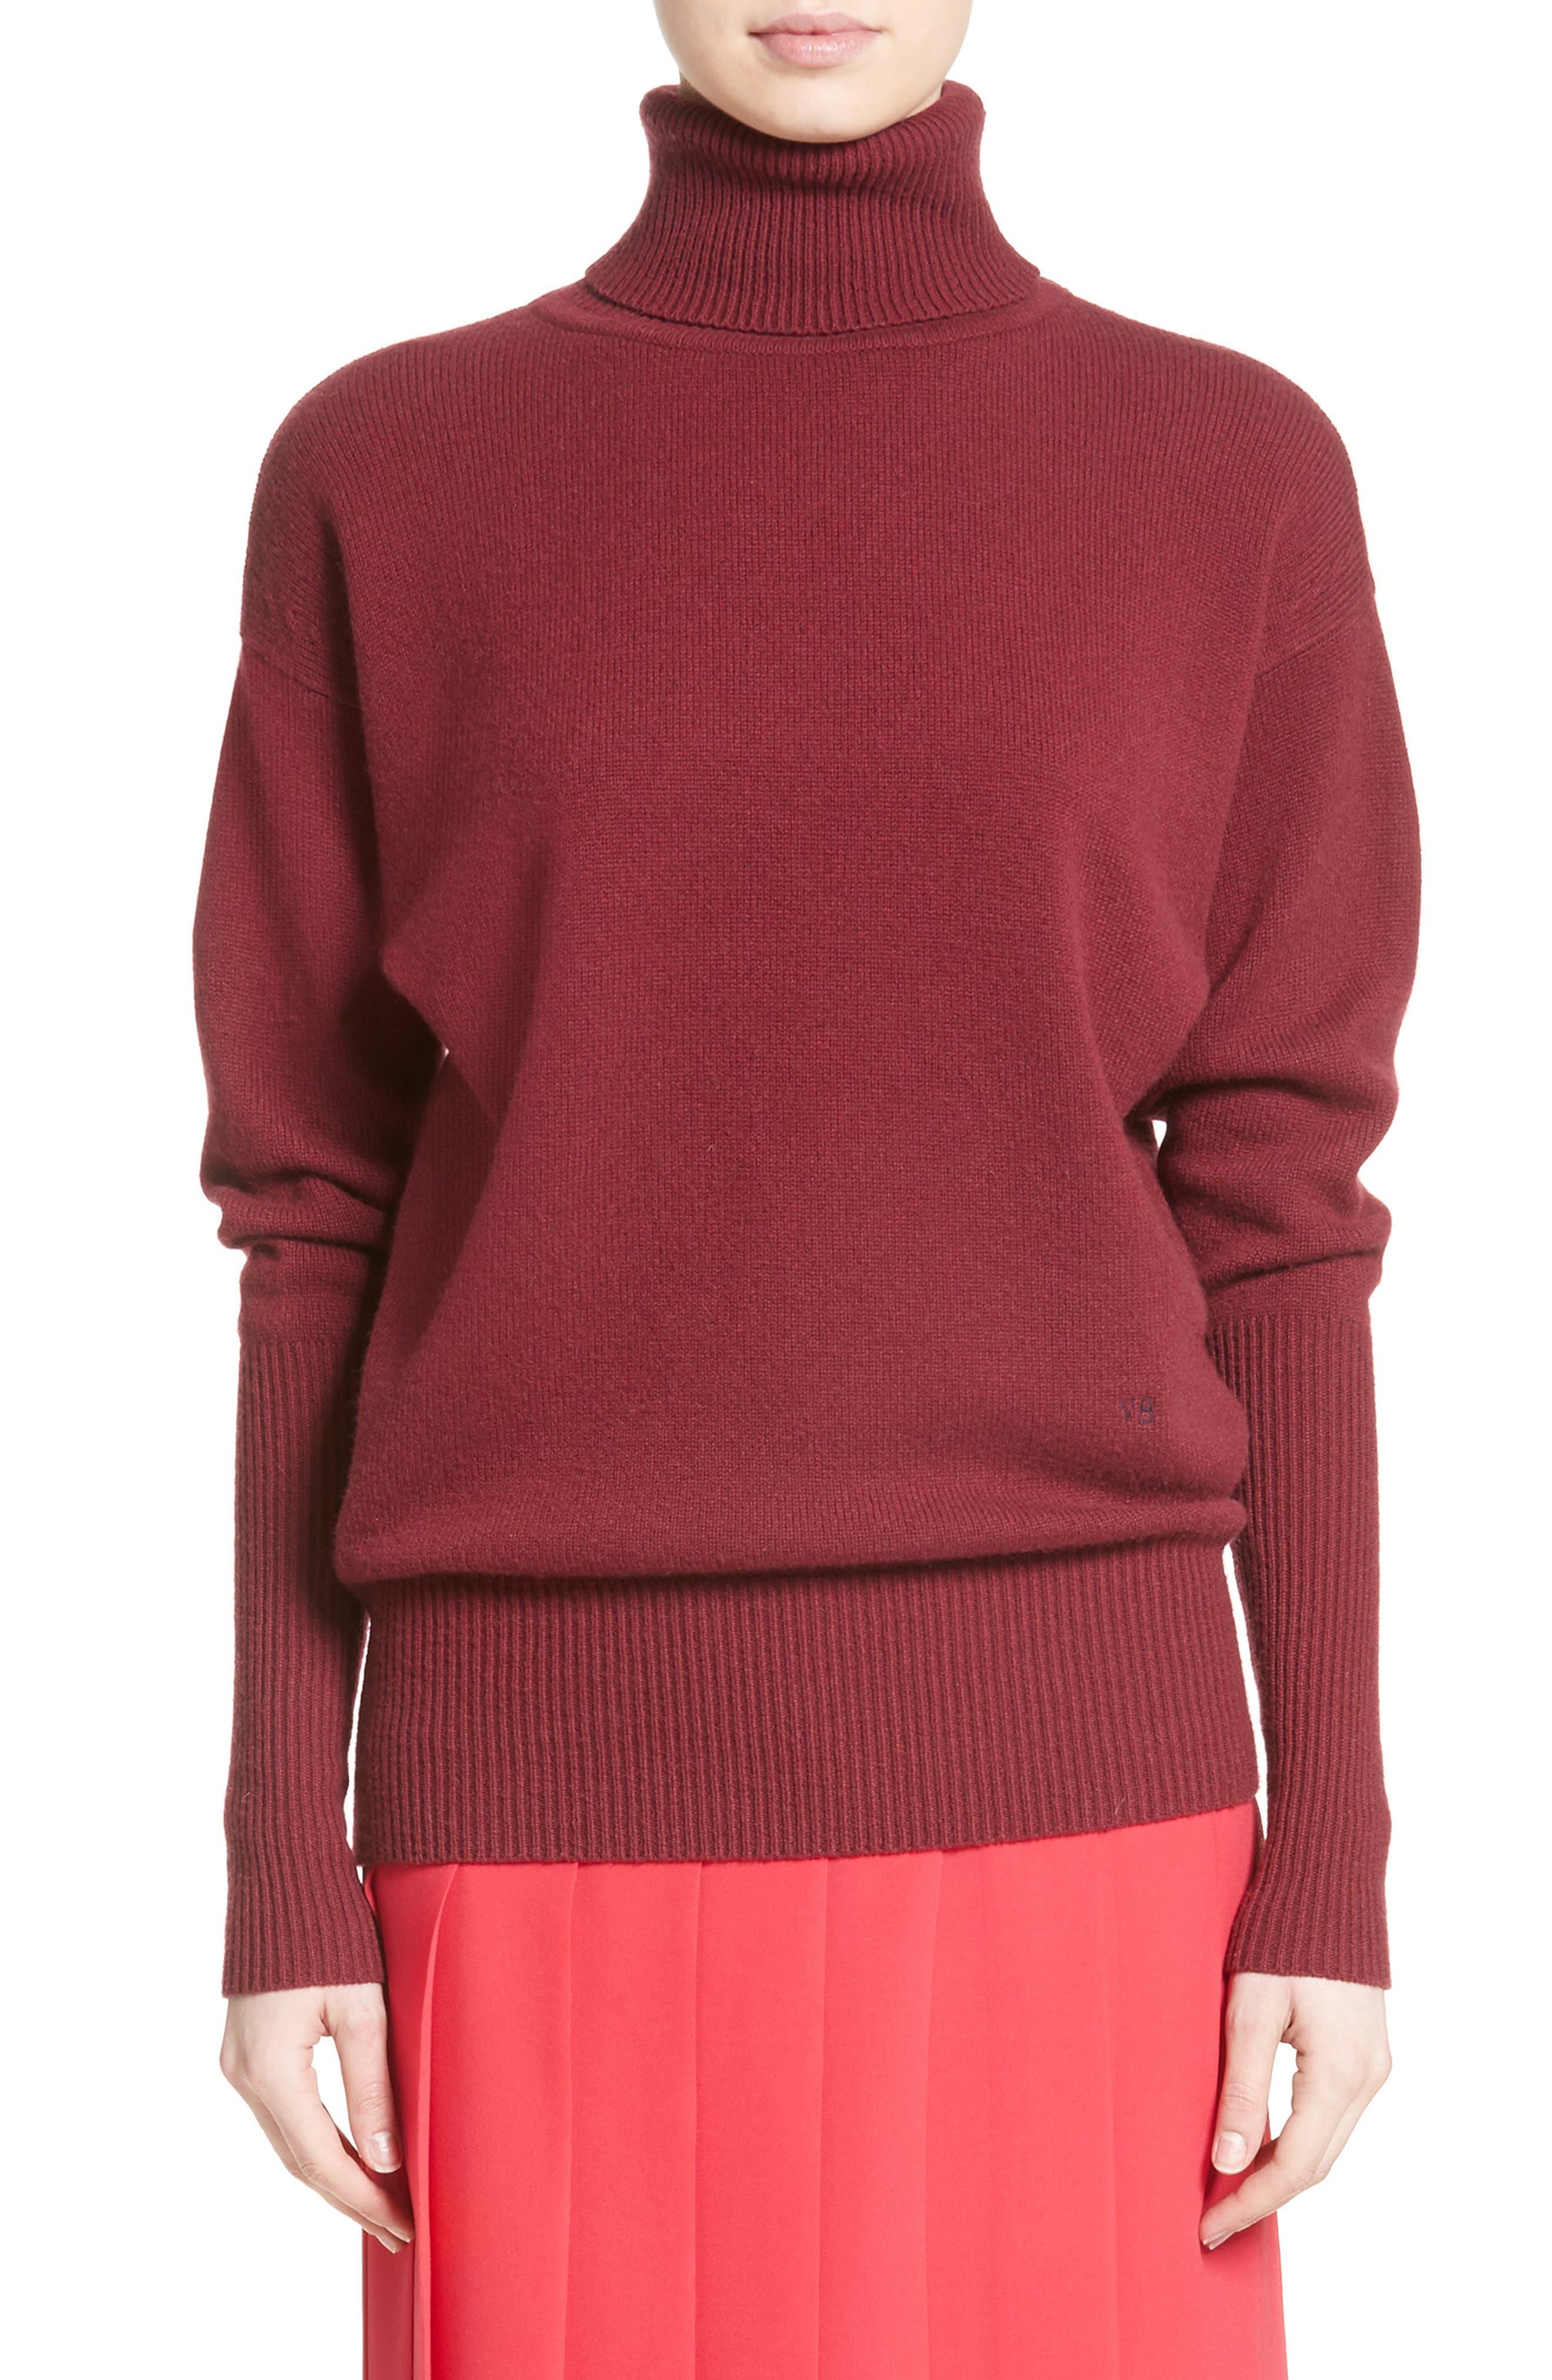 Cashmere Turtleneck Sweater,                             Main thumbnail 1, color,                             Cherry